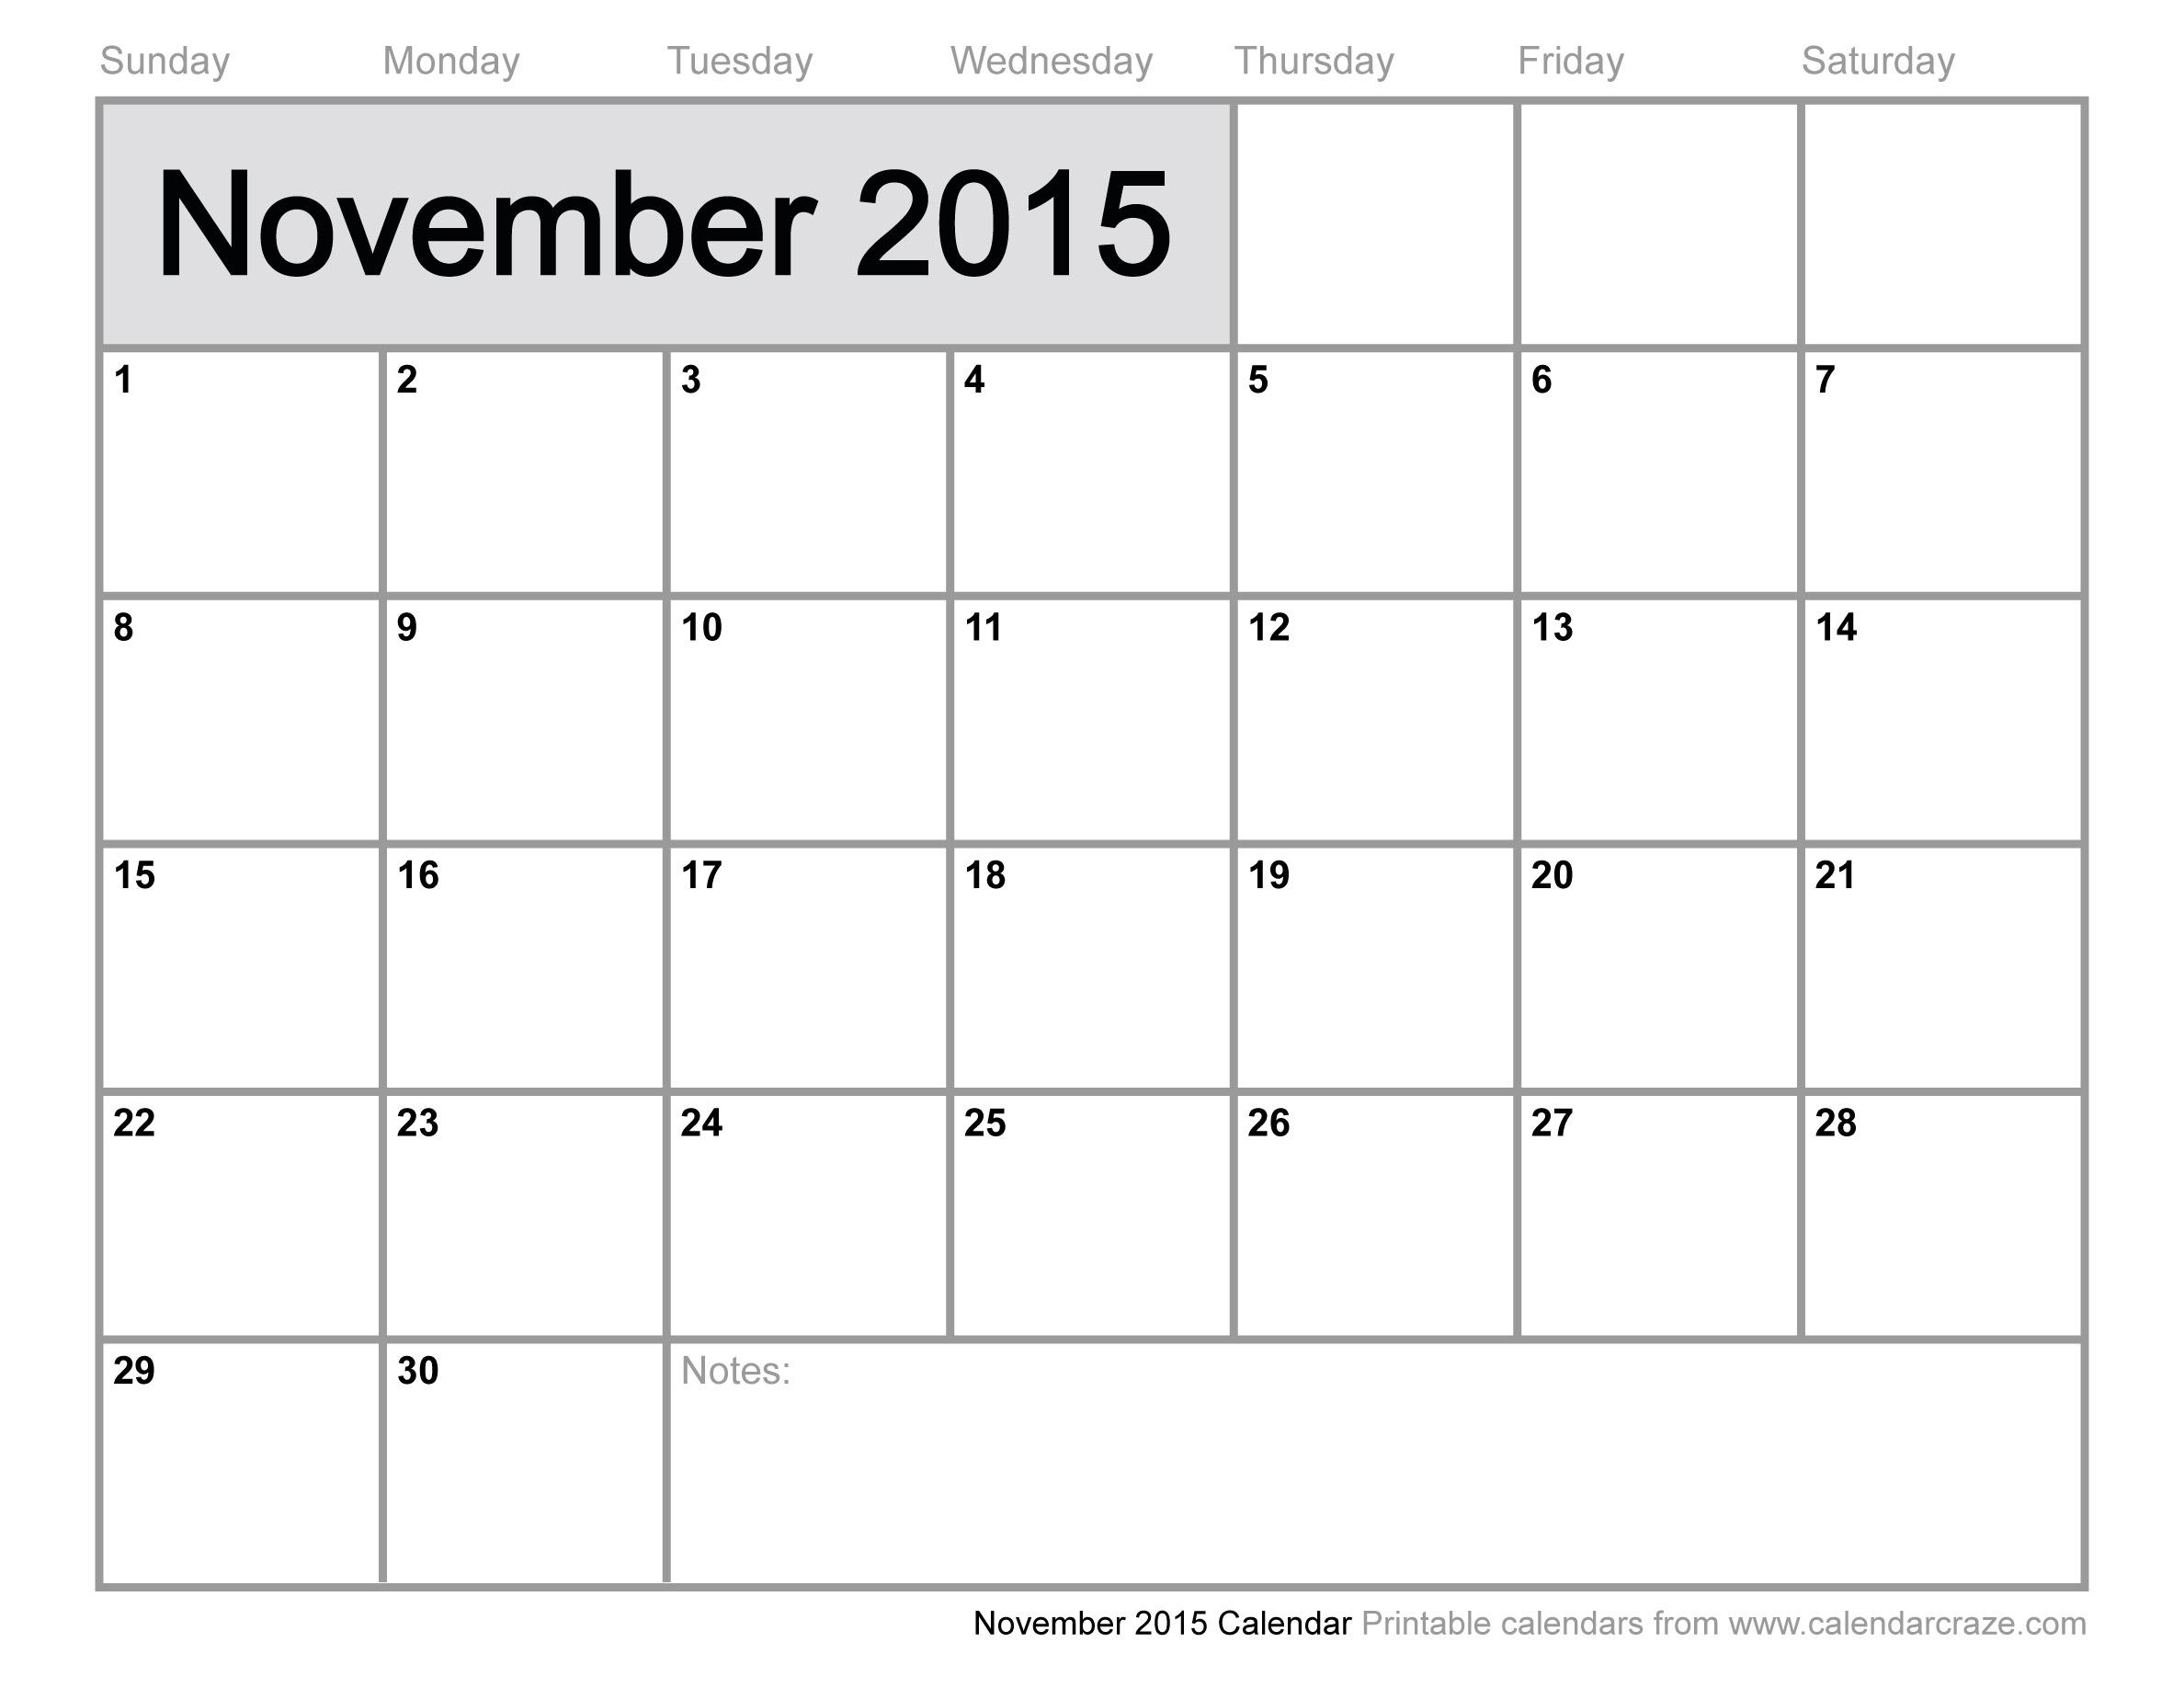 7 Images of November 2015 Calendar Printable